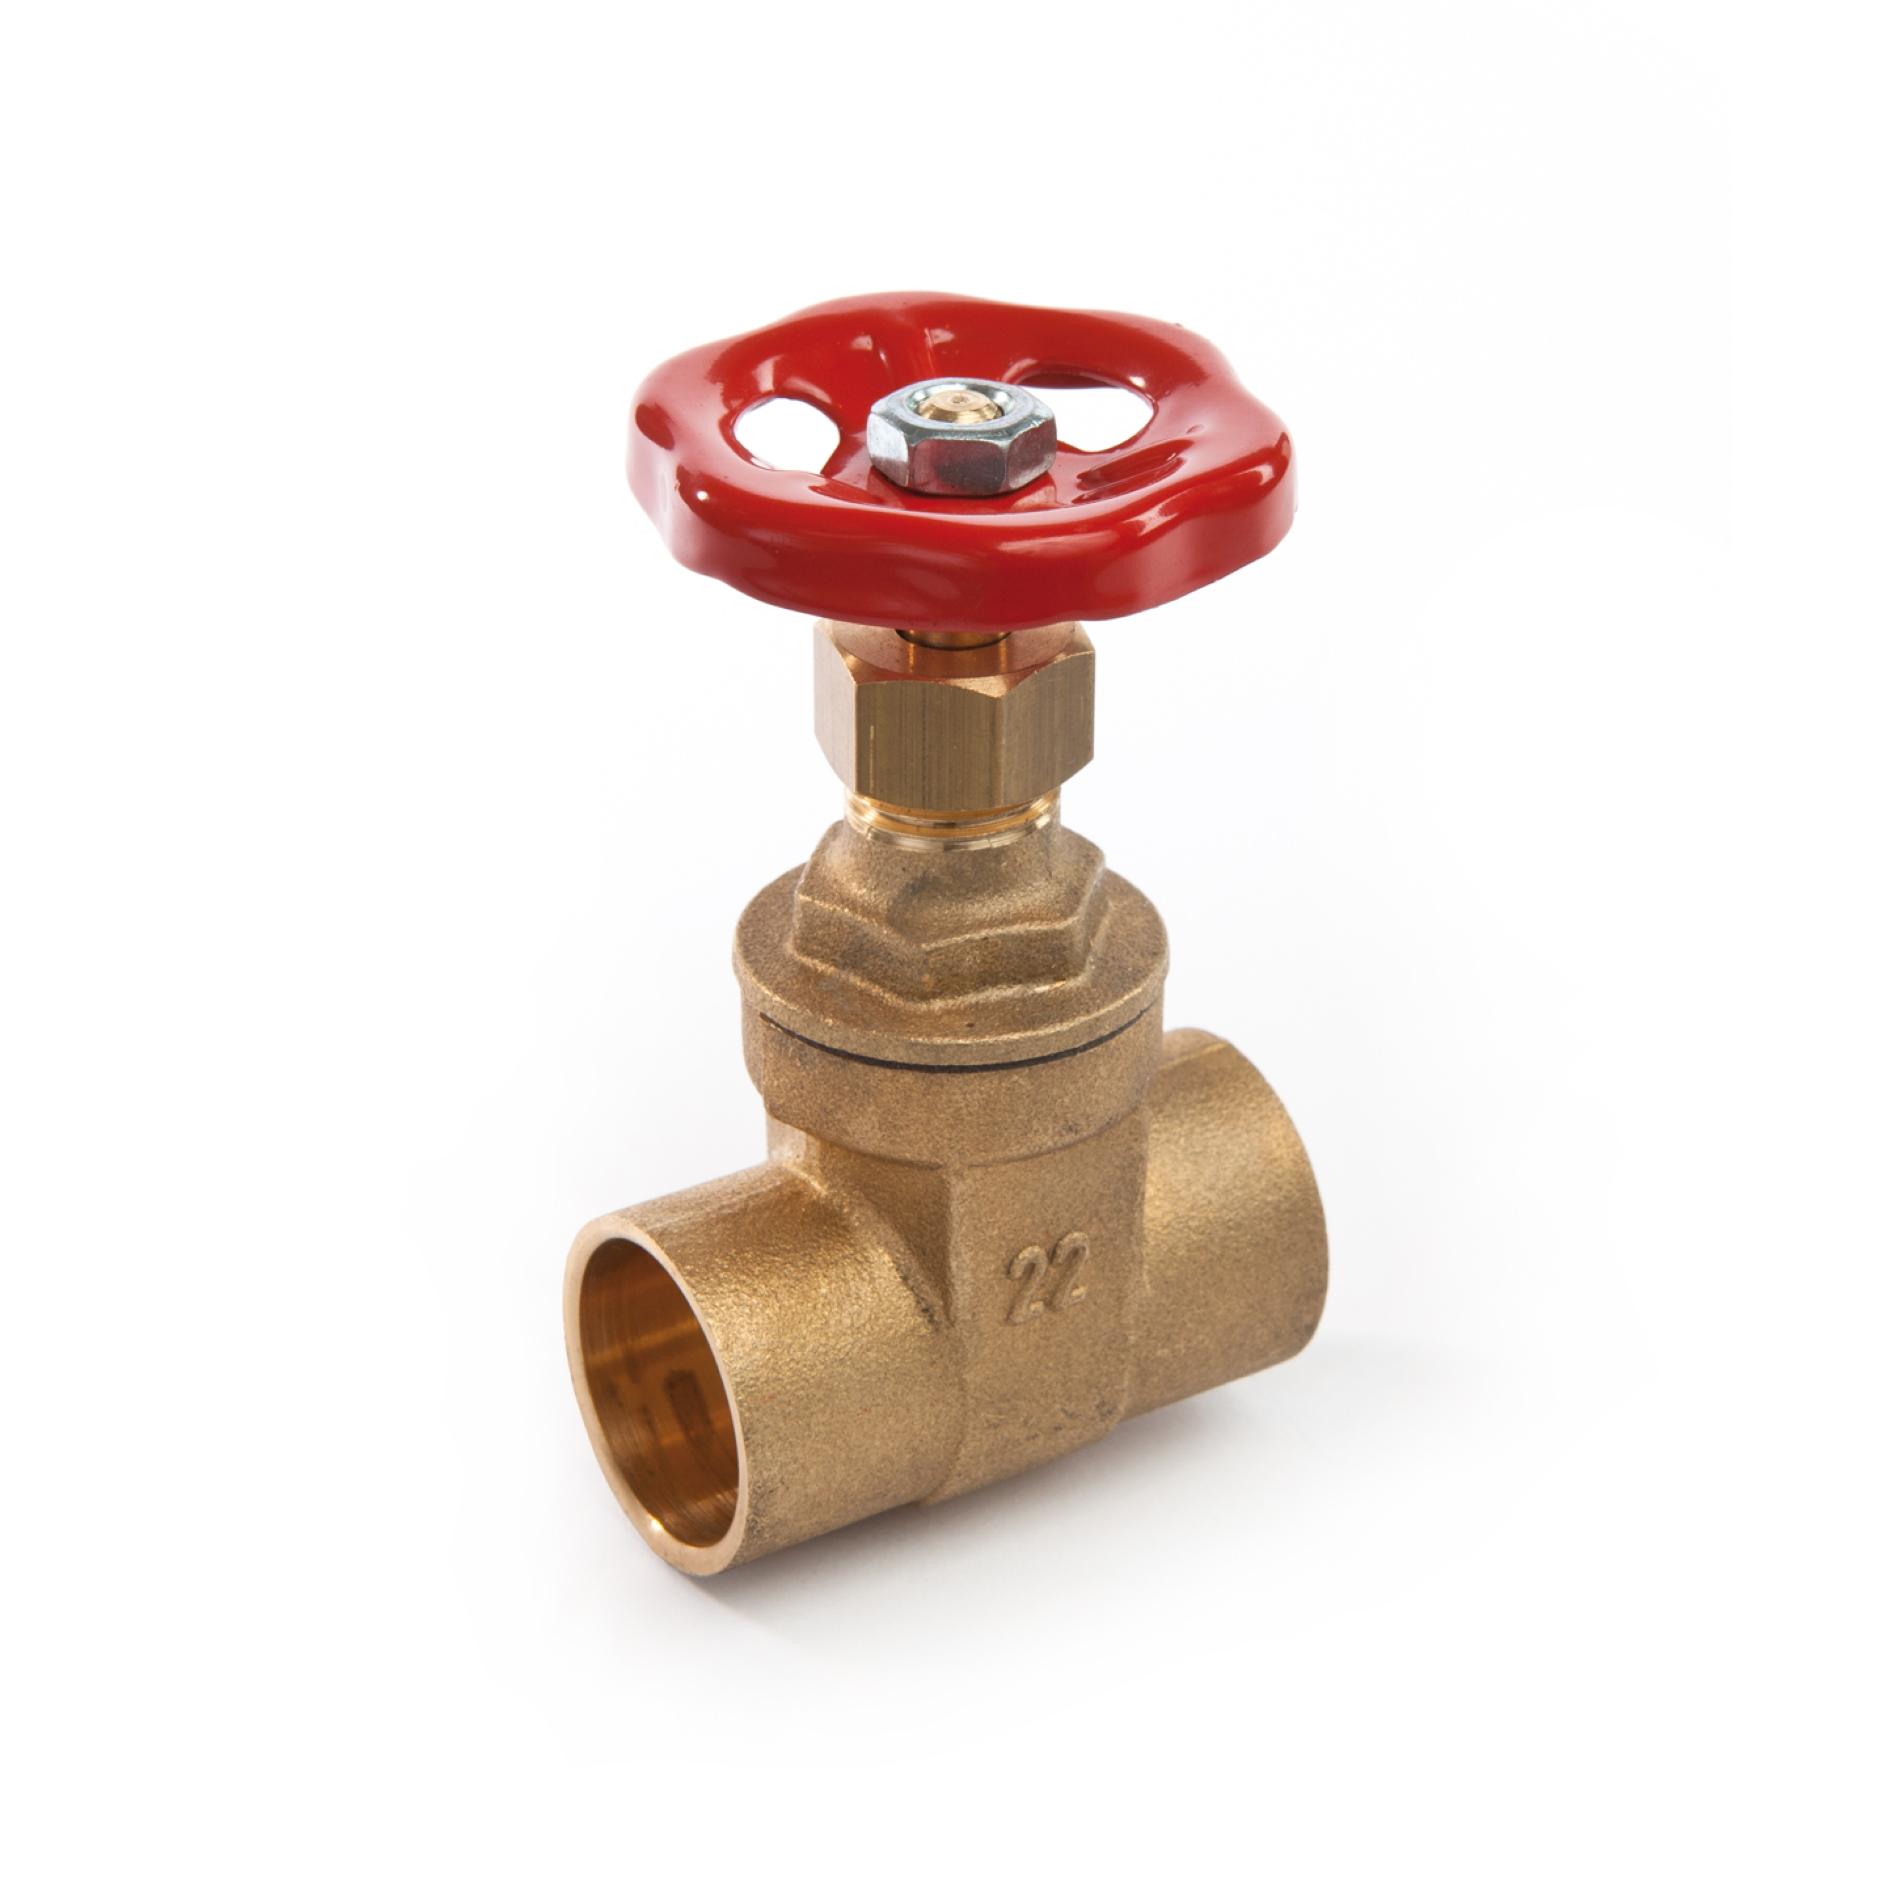 226 Saracinesca ottone per tubo rame attacchi a saldare Brass gate valve welding connections PN16